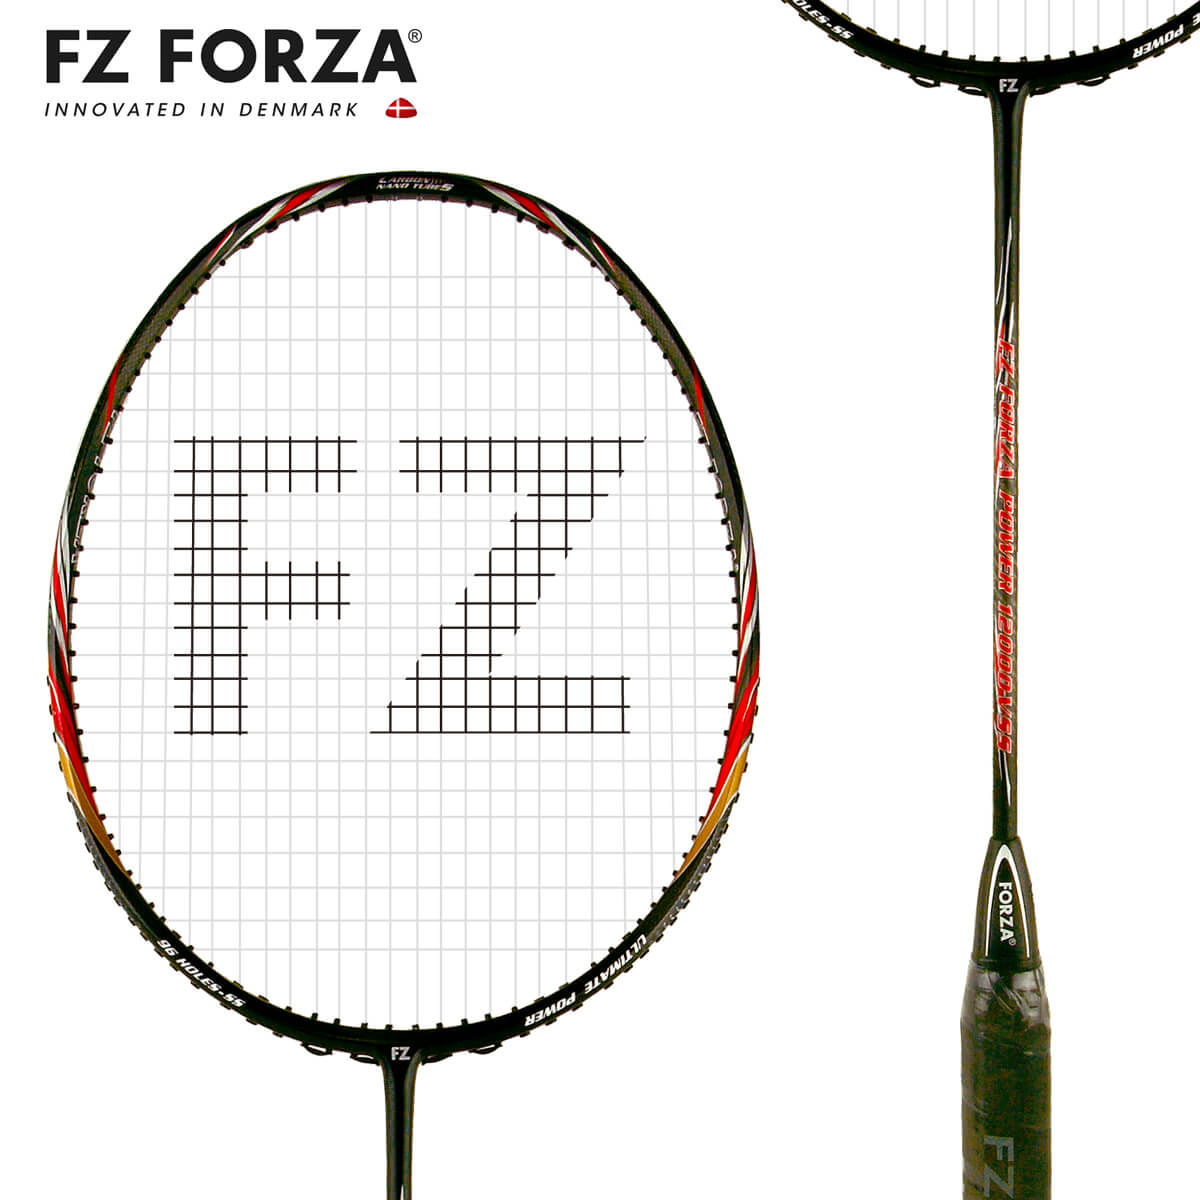 FZ FORZA Power12000 VSS 96ホール FZ フォーザ バドミントンラケット【オススメガット&ガット張り工賃無料】